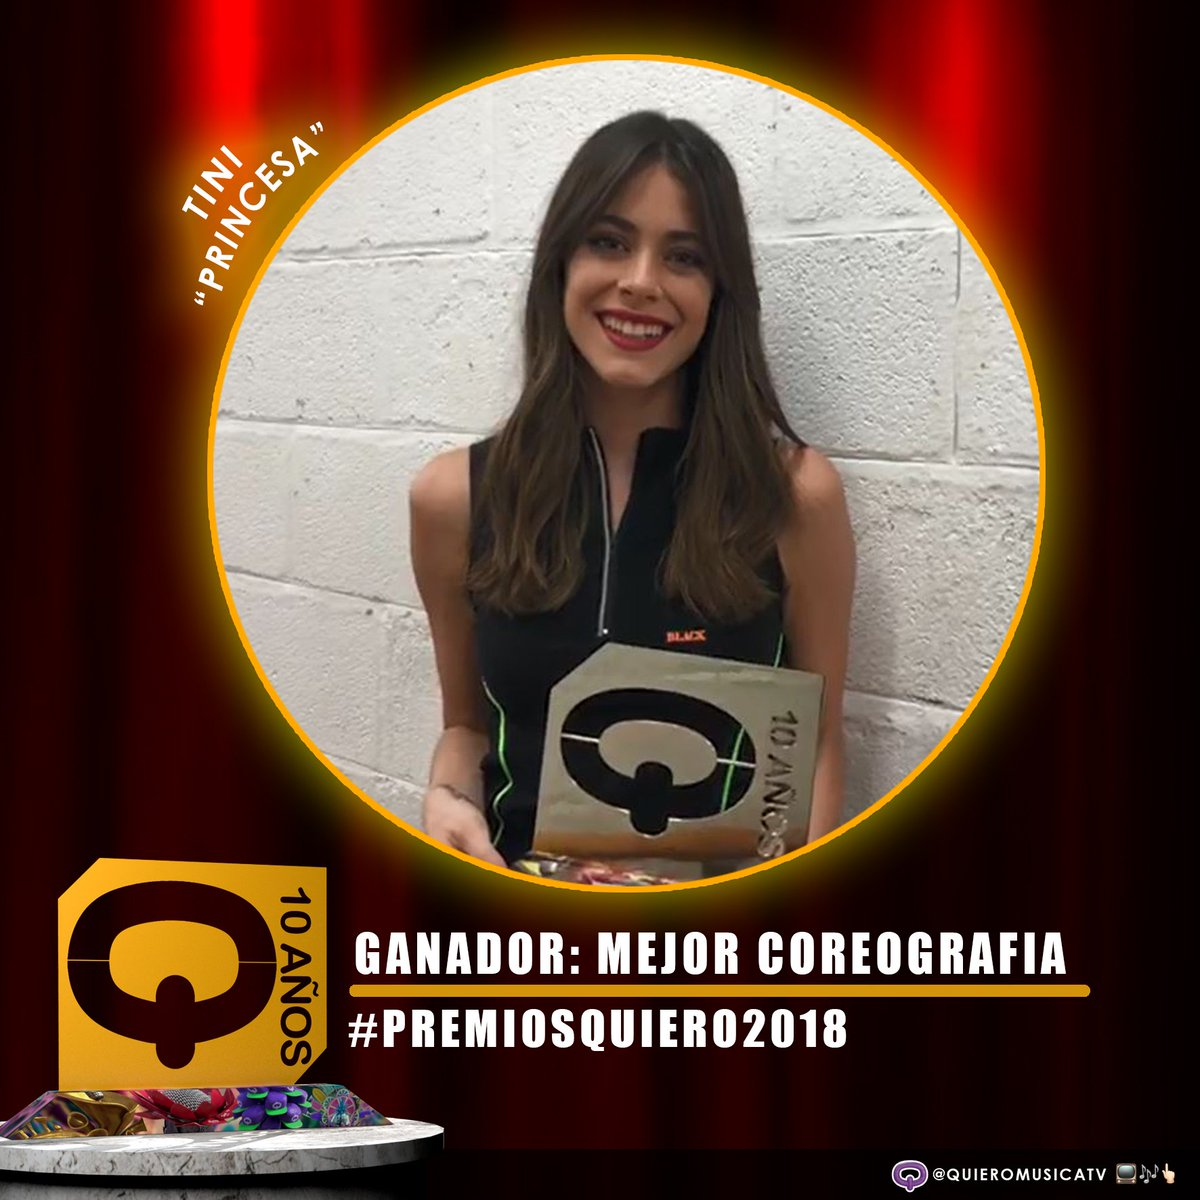 #PremiosQuiero2018 🏆🔥 #MejorCoreografia ¡Felicitaciones @TiniStoessel ! #Princesa 🙌🏻👏🏼😍